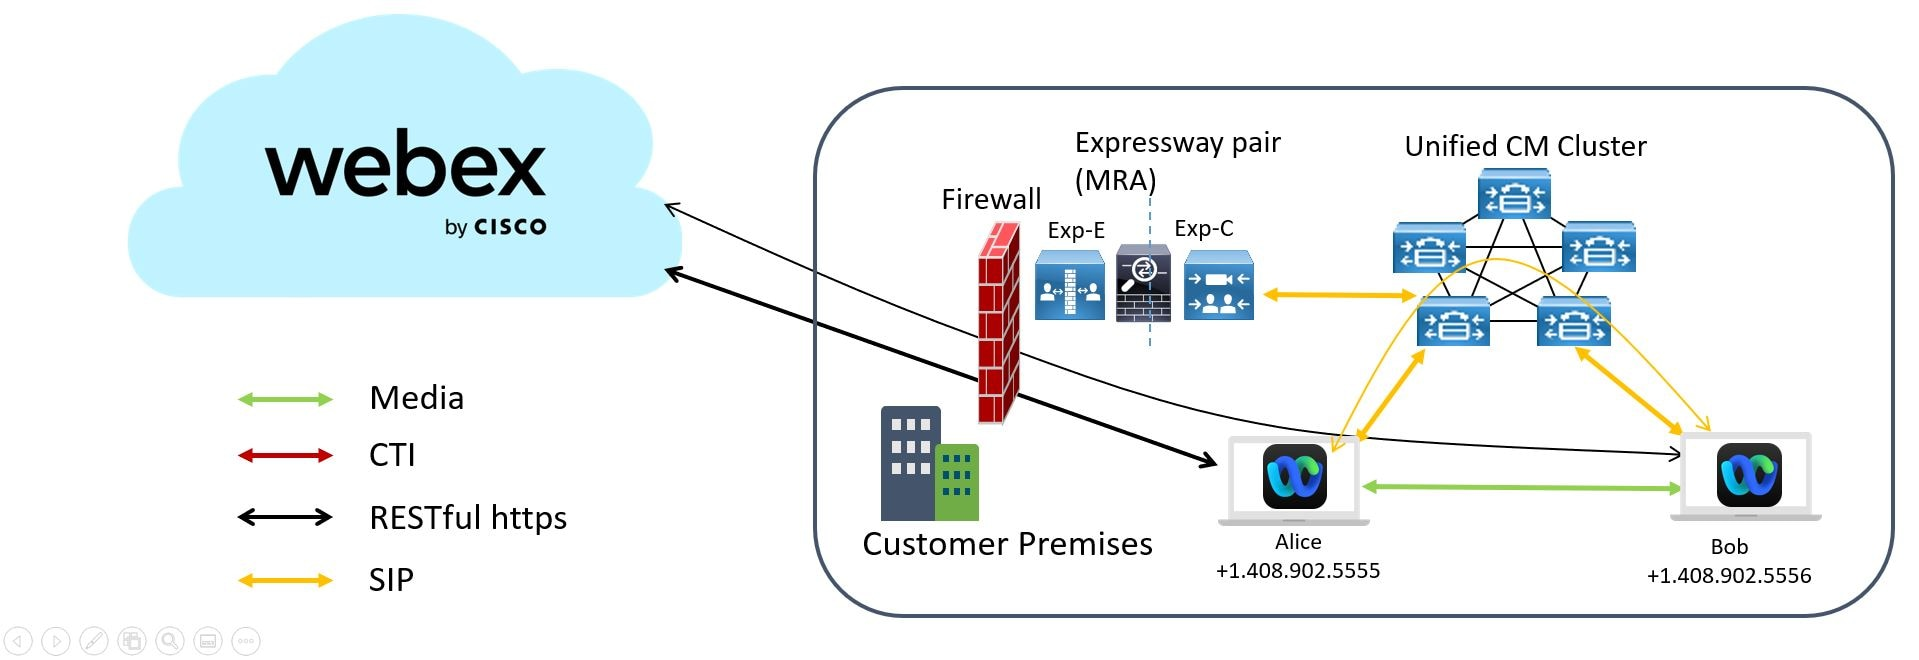 Cisco cover image